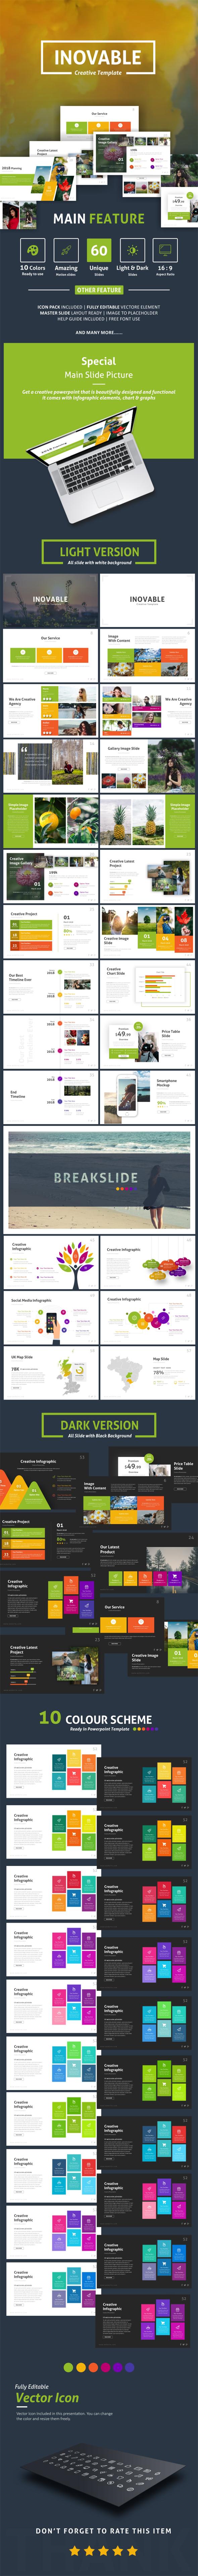 Inovable - Creative Presentation Template - Creative PowerPoint Templates